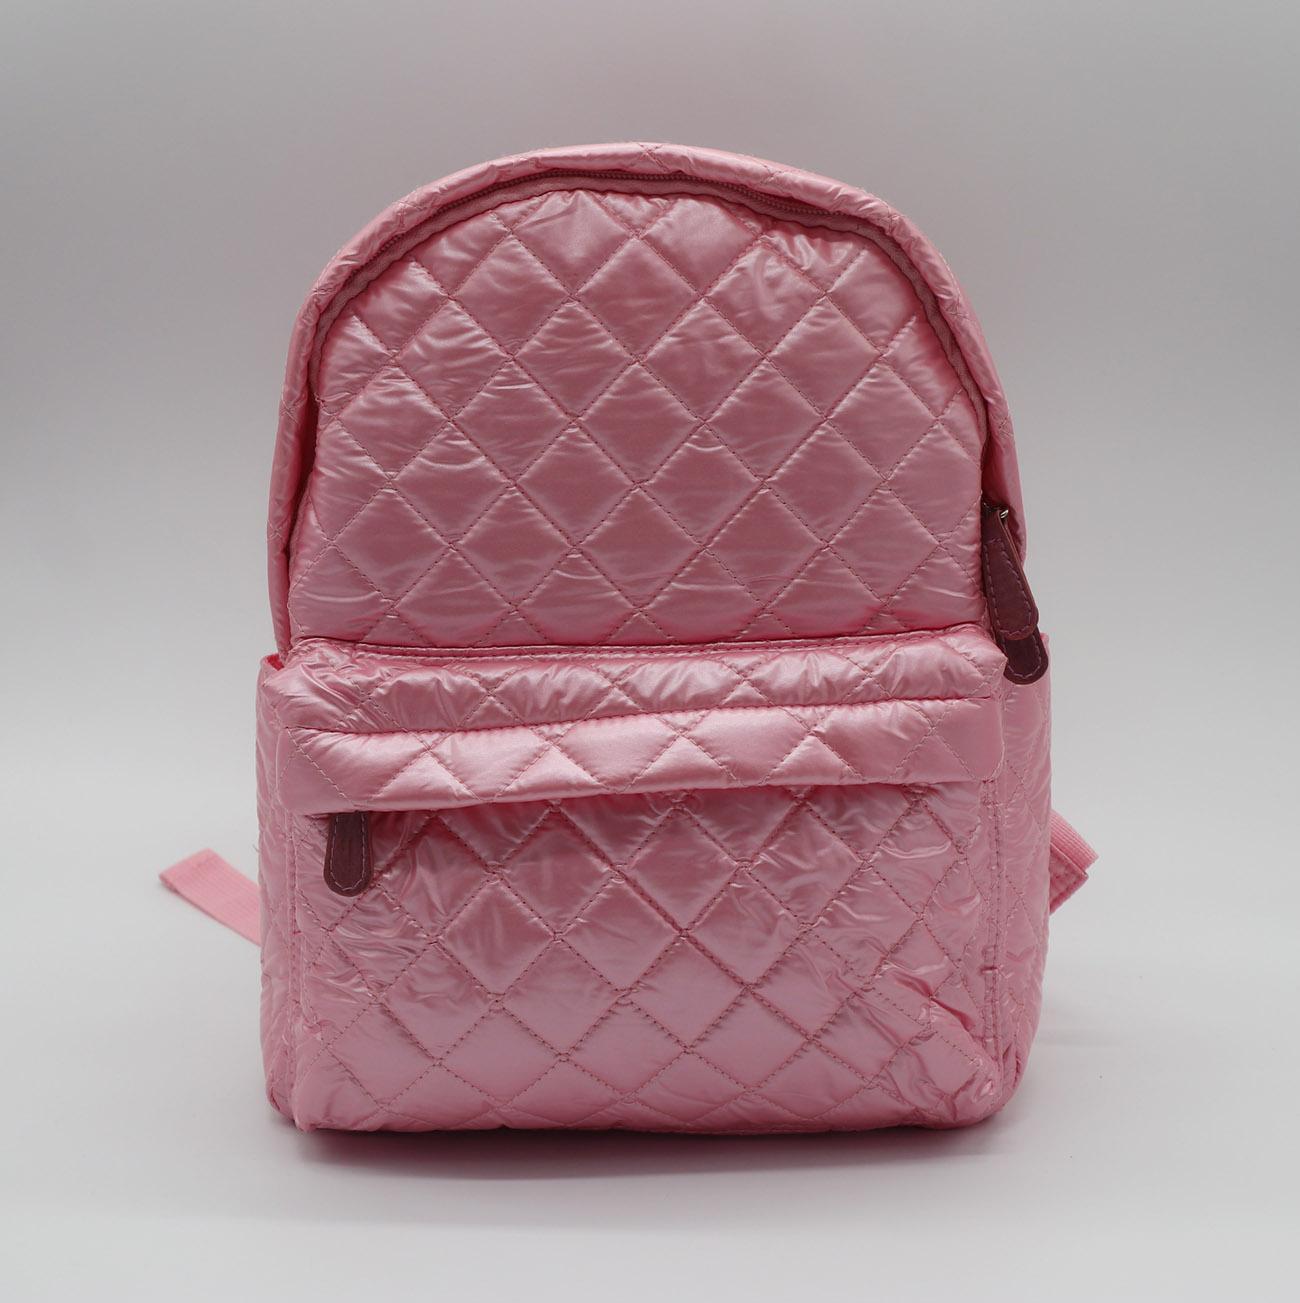 Nylon quilted lovely kids small pink school bag for kindergarten girls 1